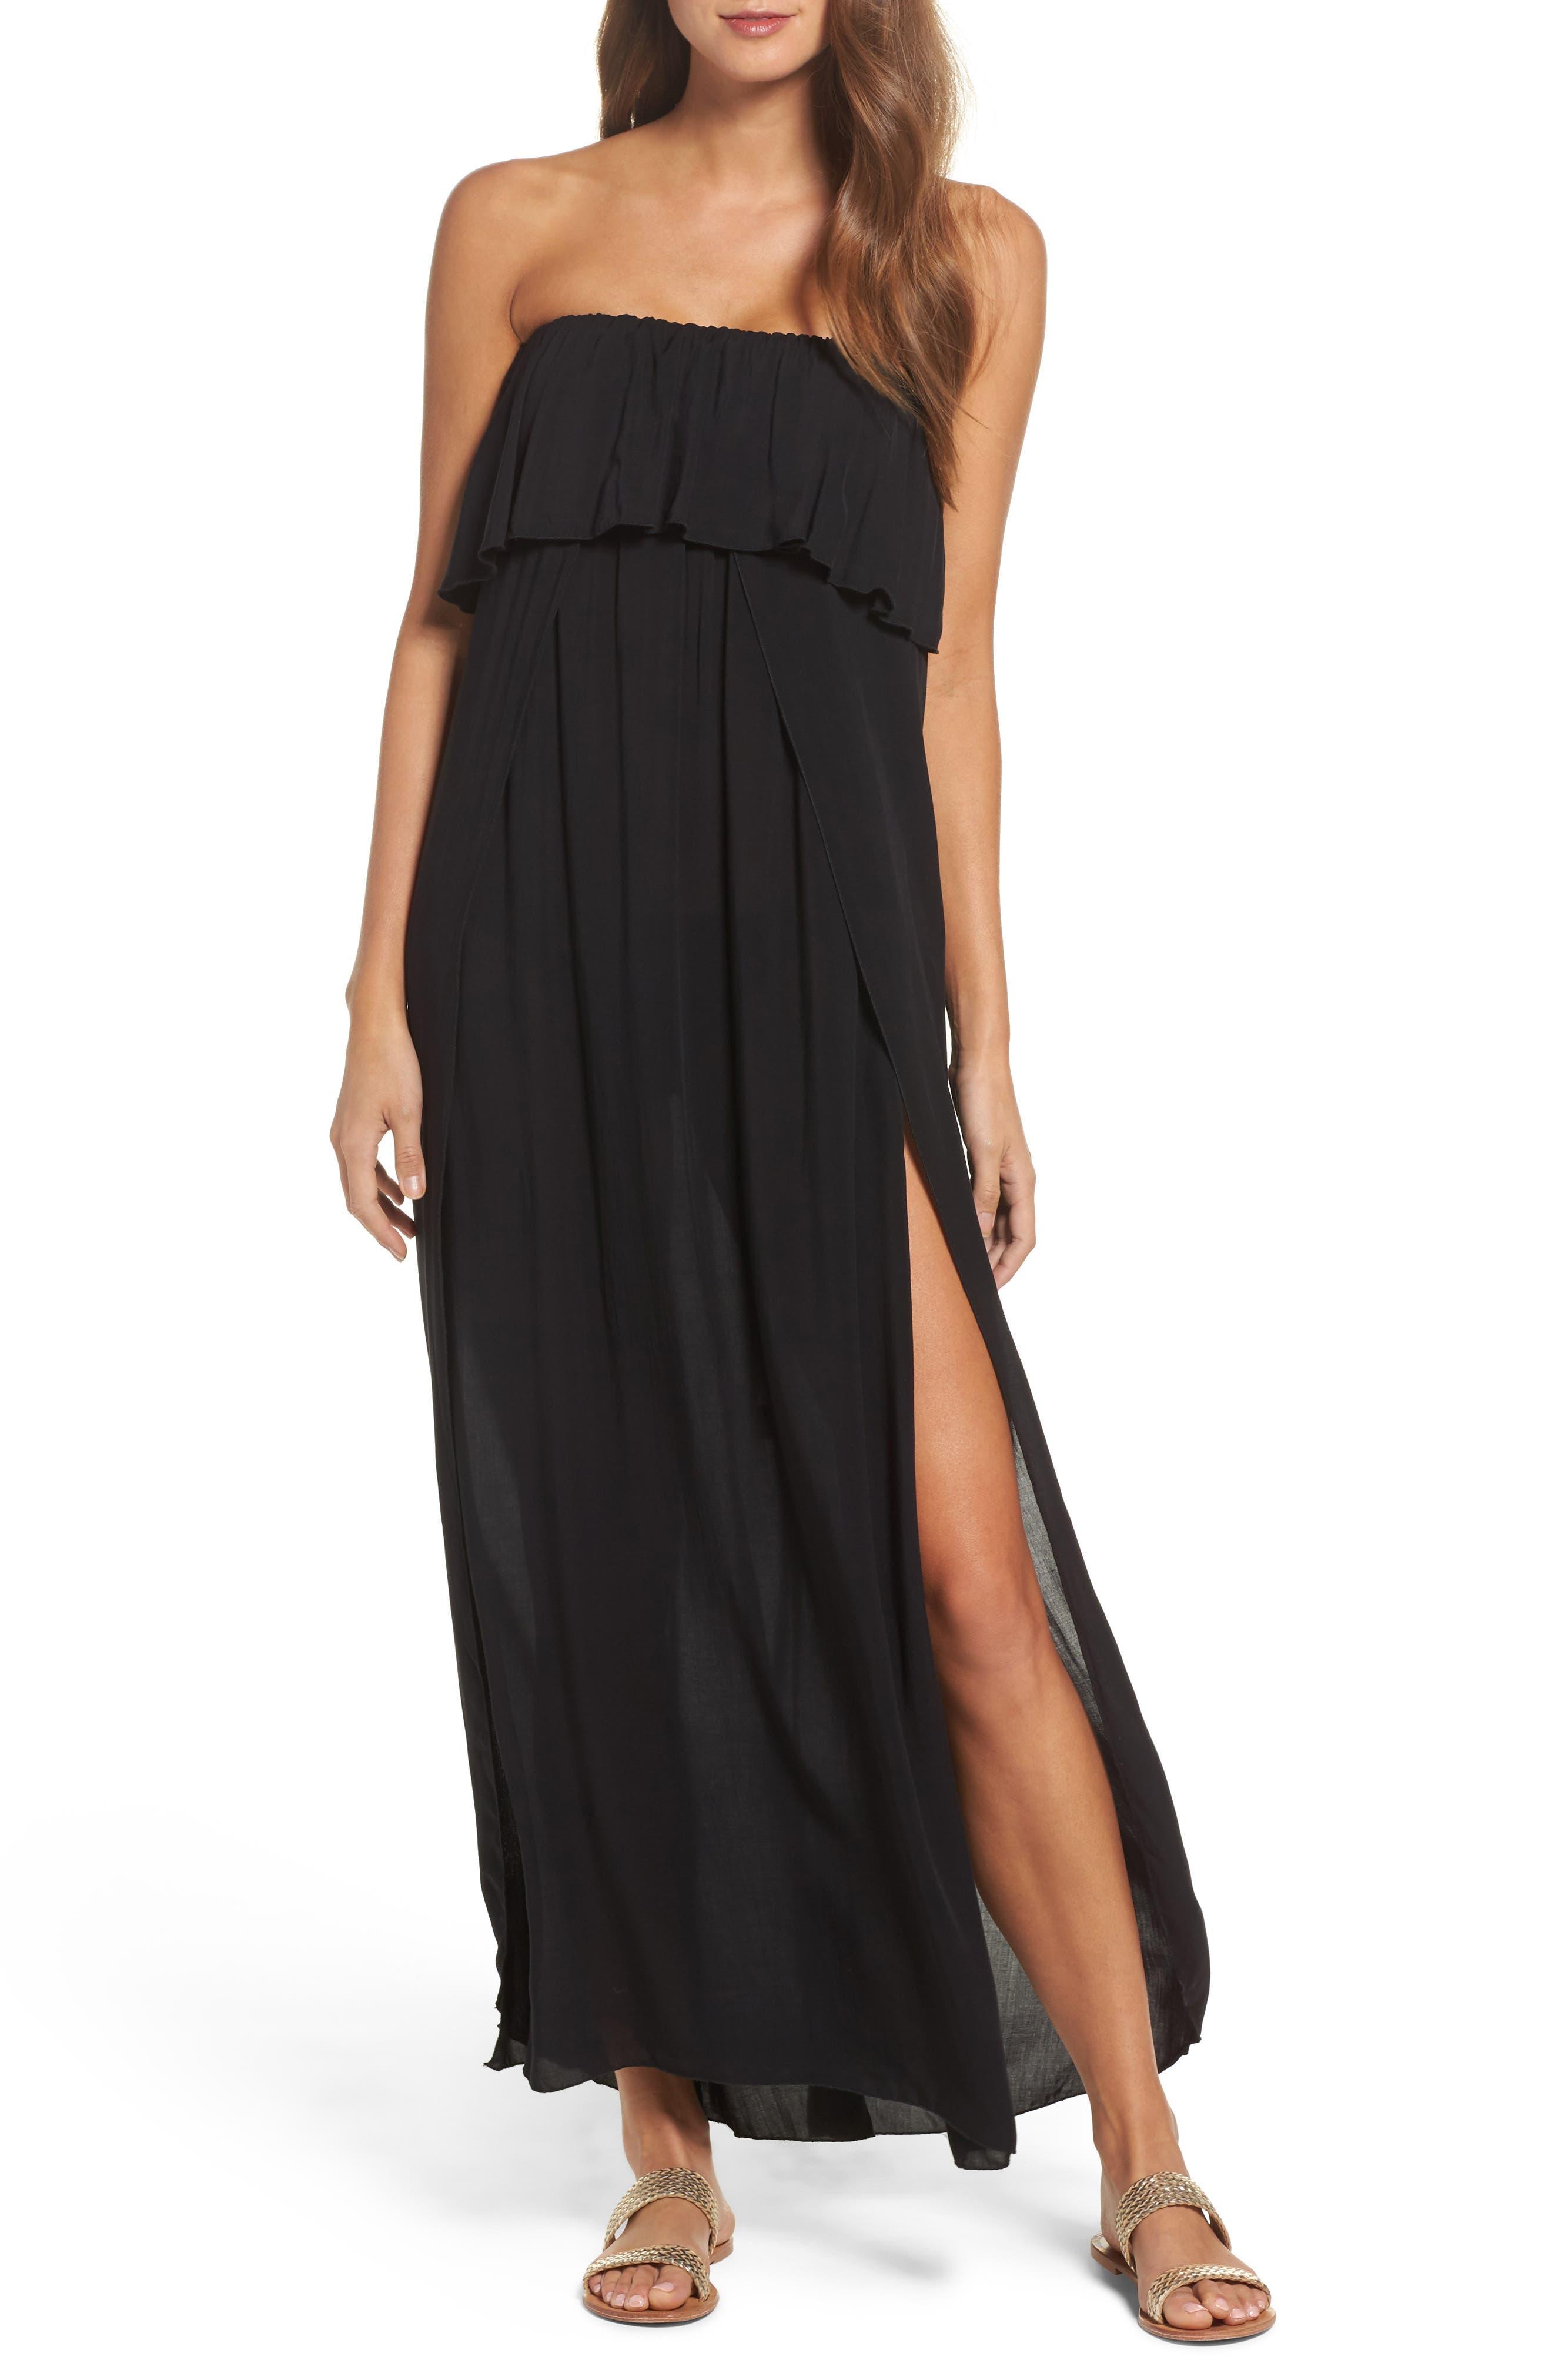 Main Image - Elan Strapless Maxi Cover-Up Dress